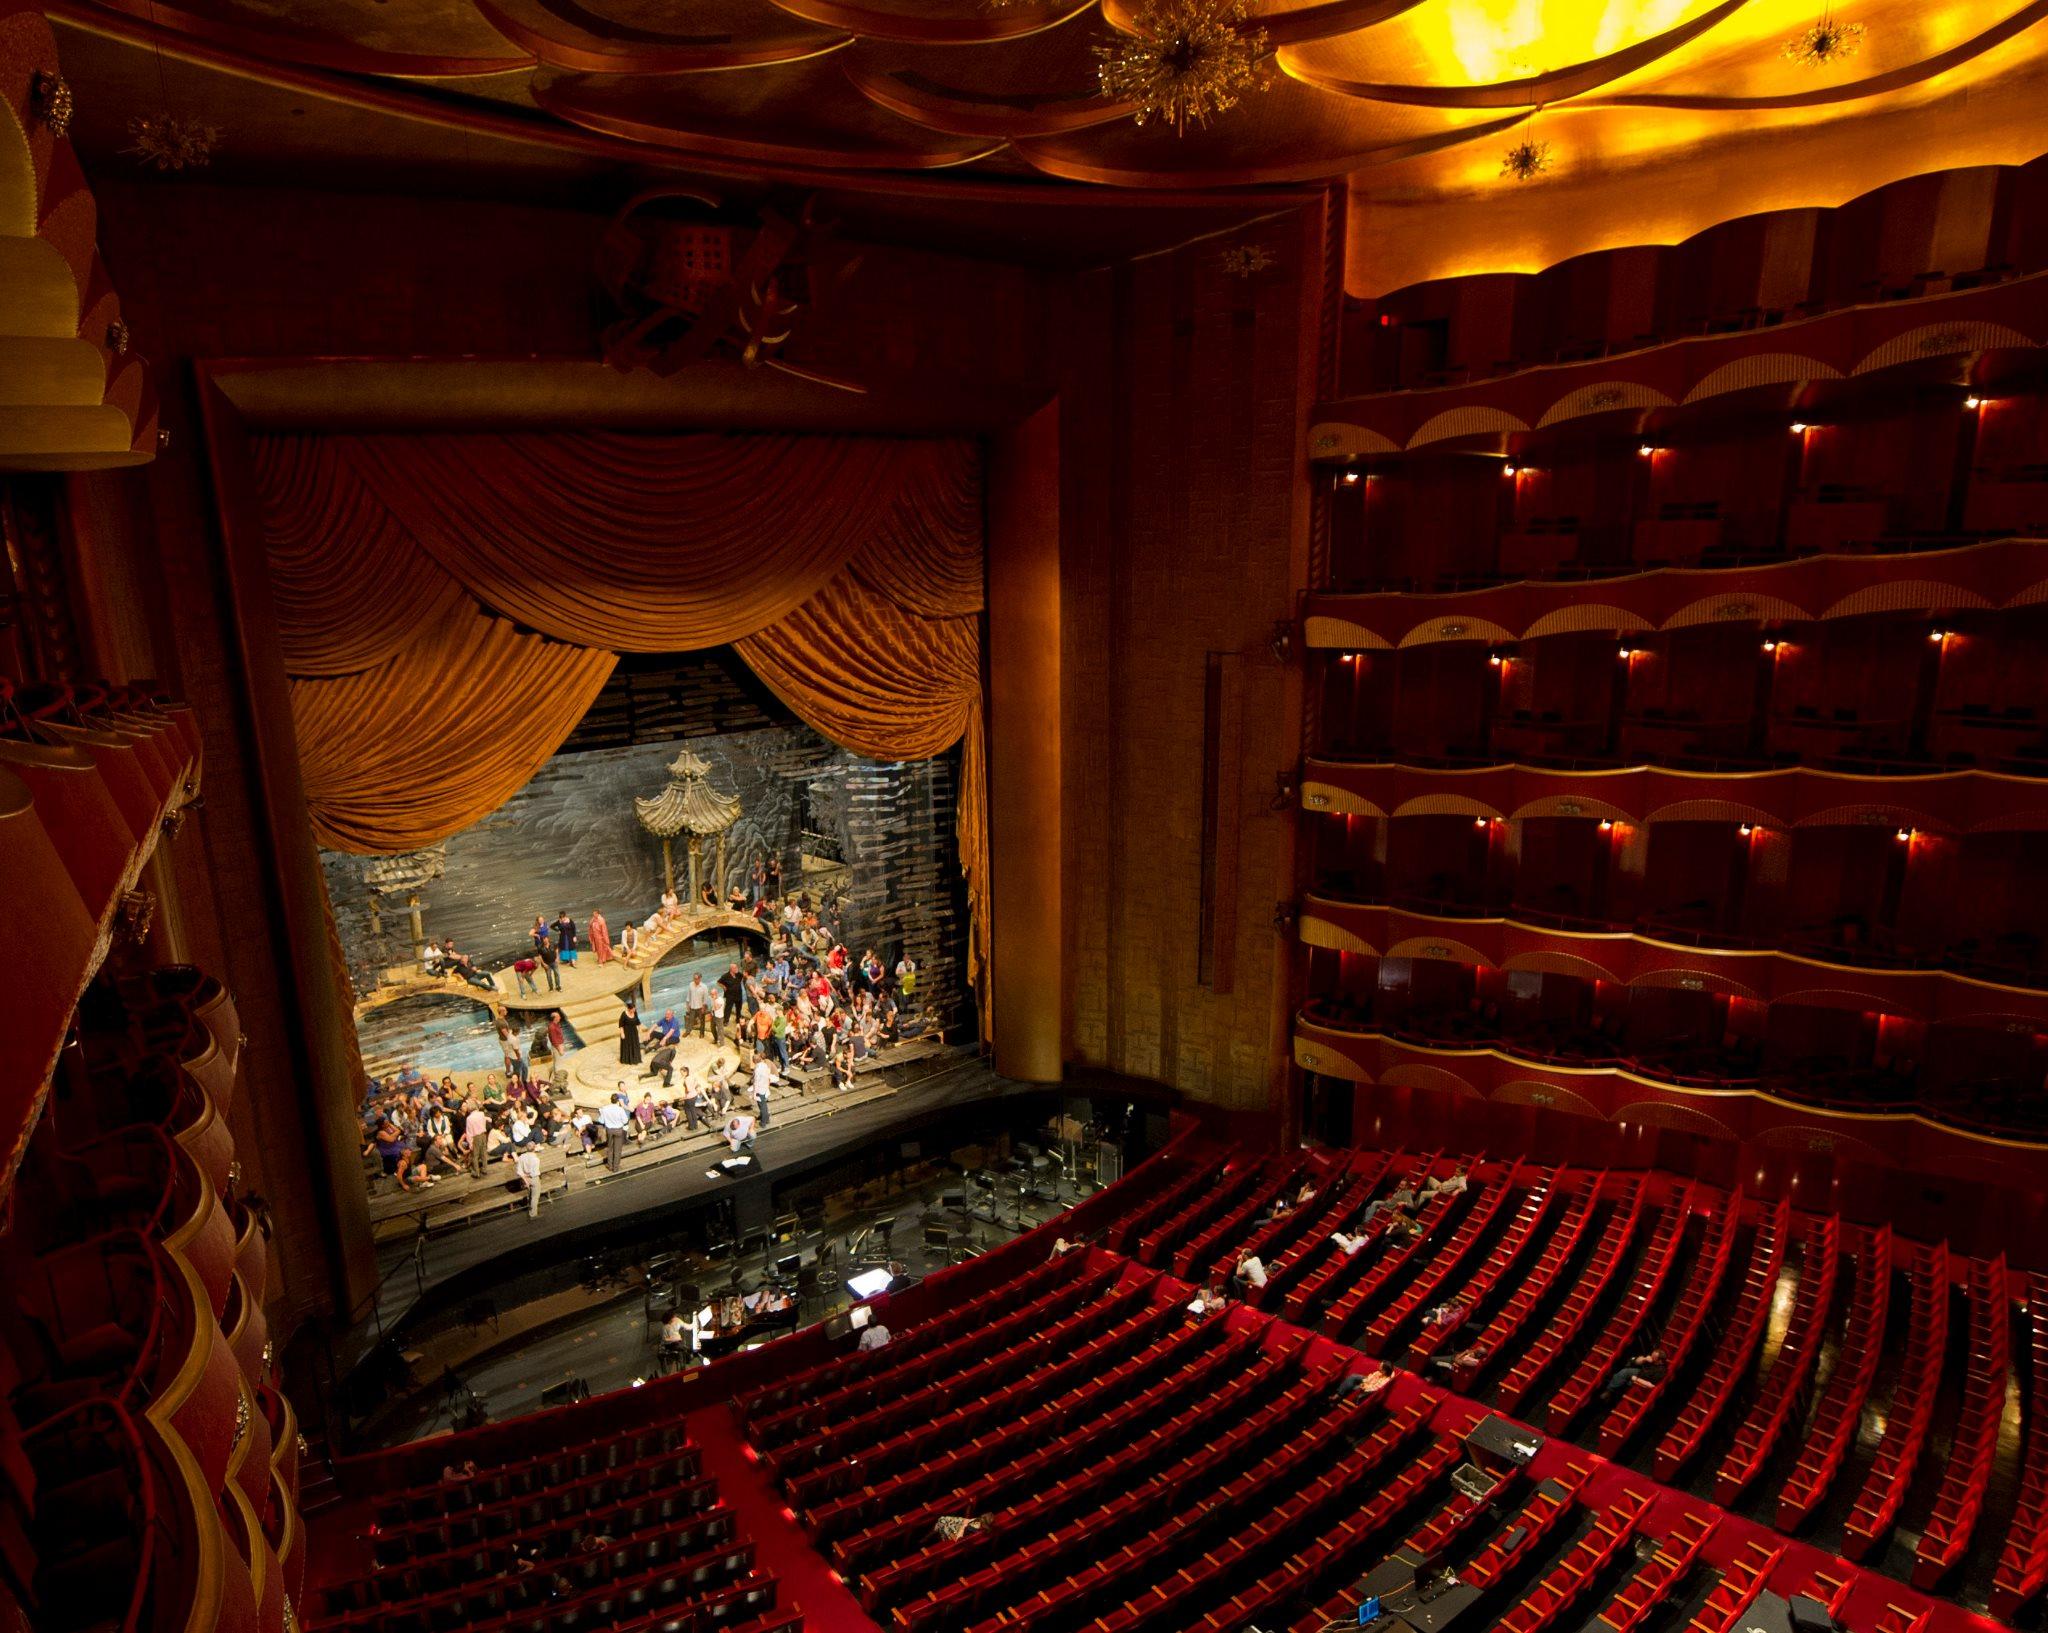 2012-09-15-TurandotRehearsal.jpg